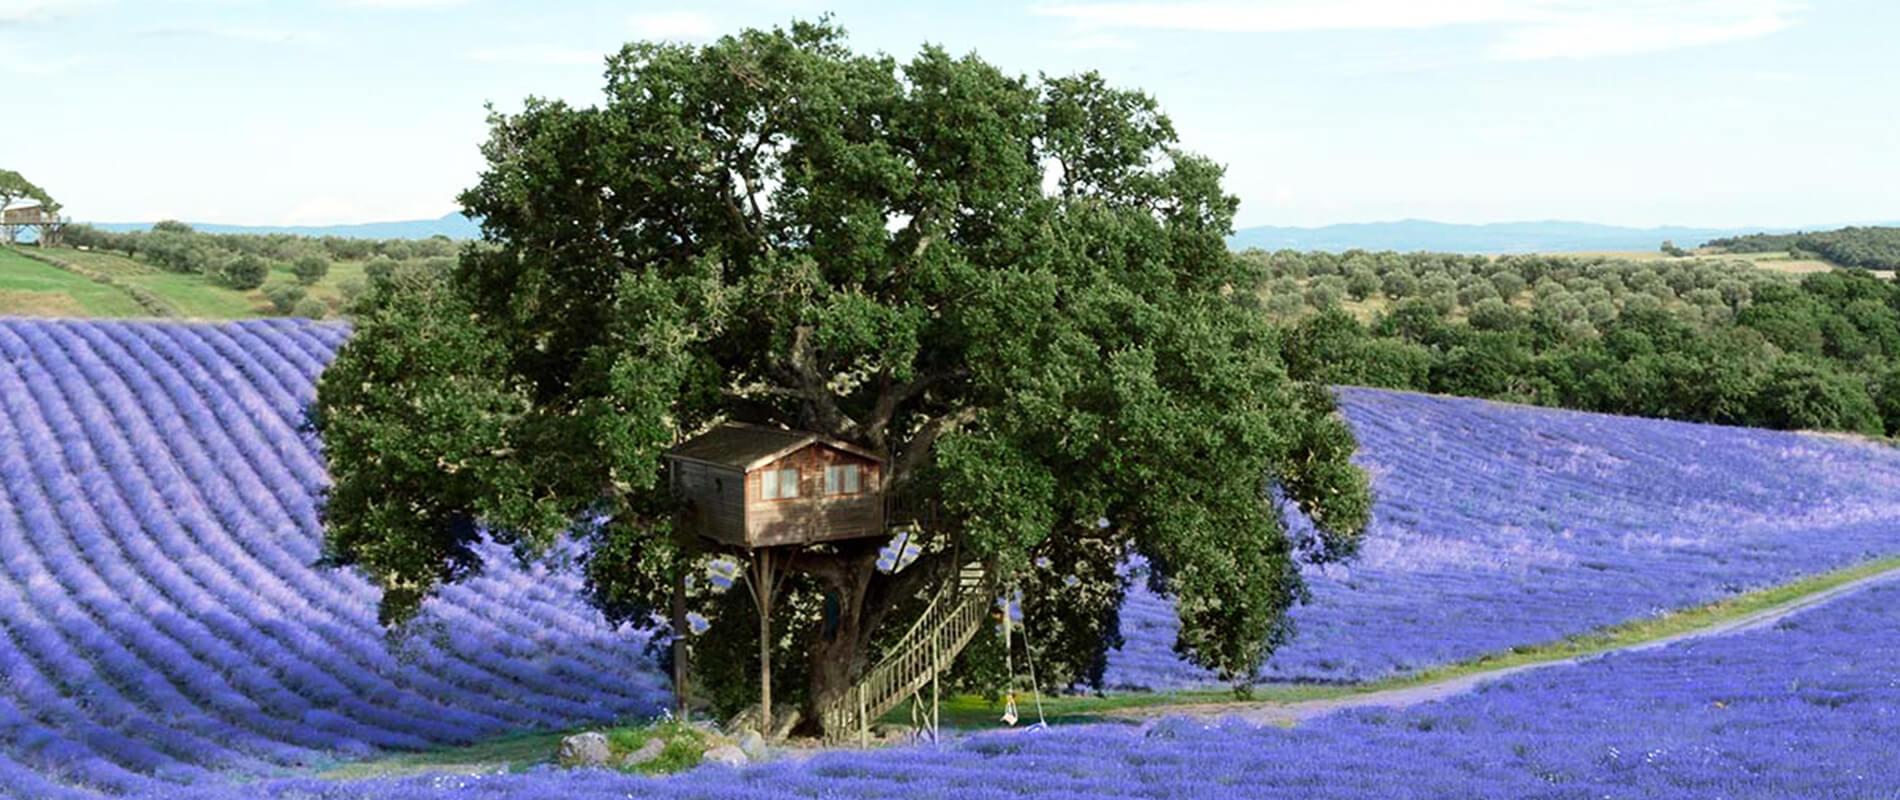 La Piantata, a Tree House Among Lavender Fields